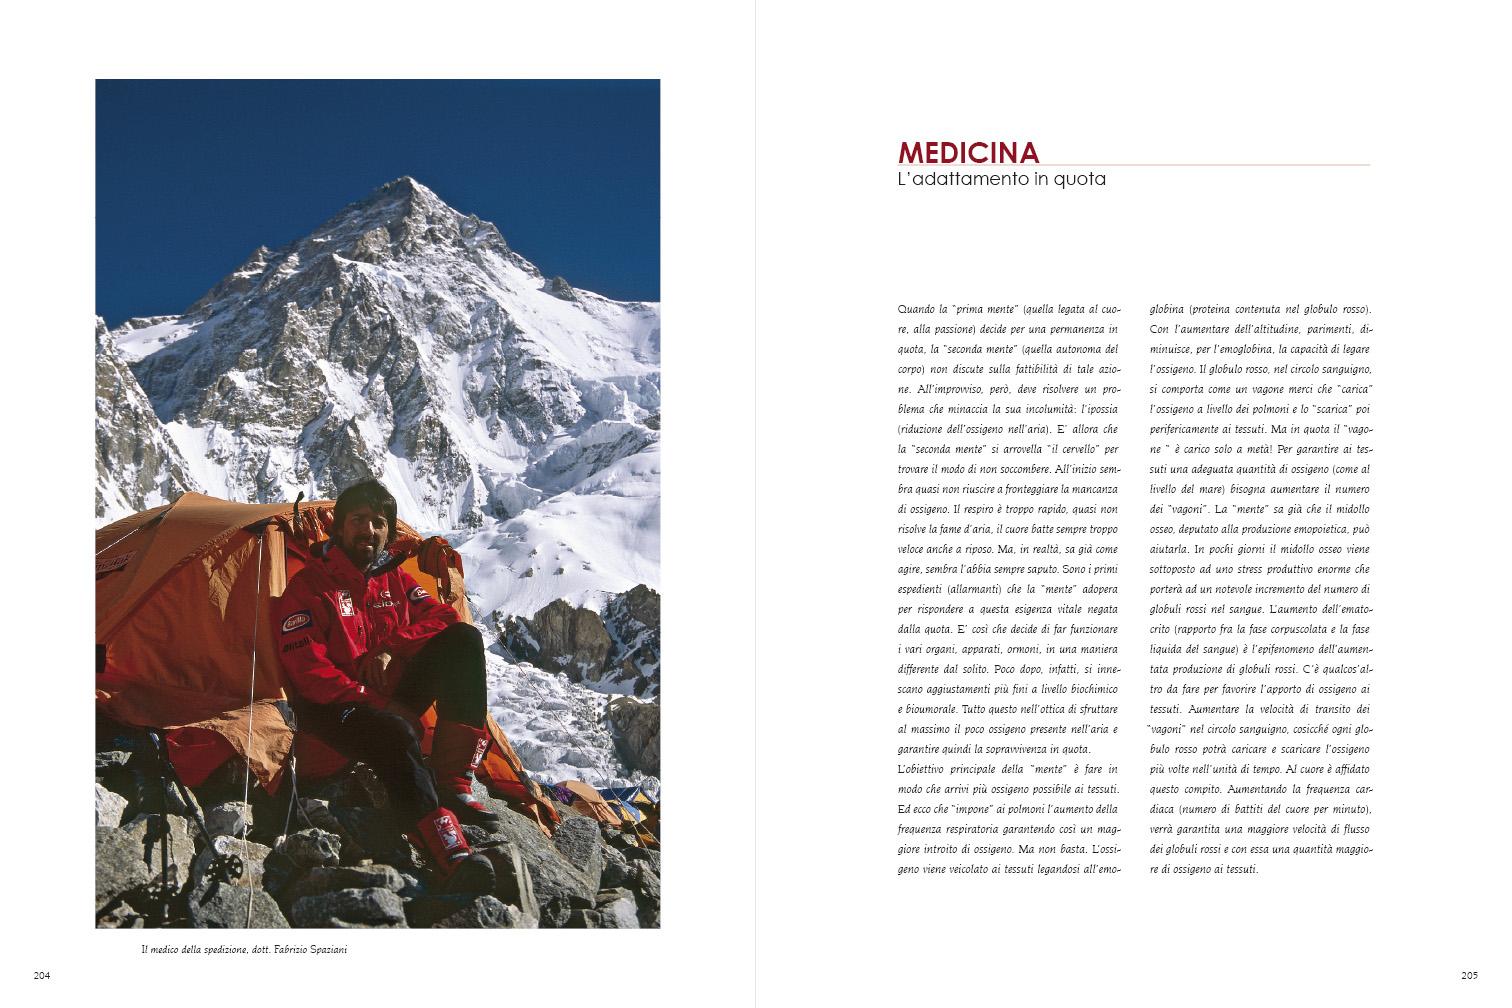 K2 EXPEDITION 1954-2004 Giuseppe Ghedina Fotografo - 104.jpg